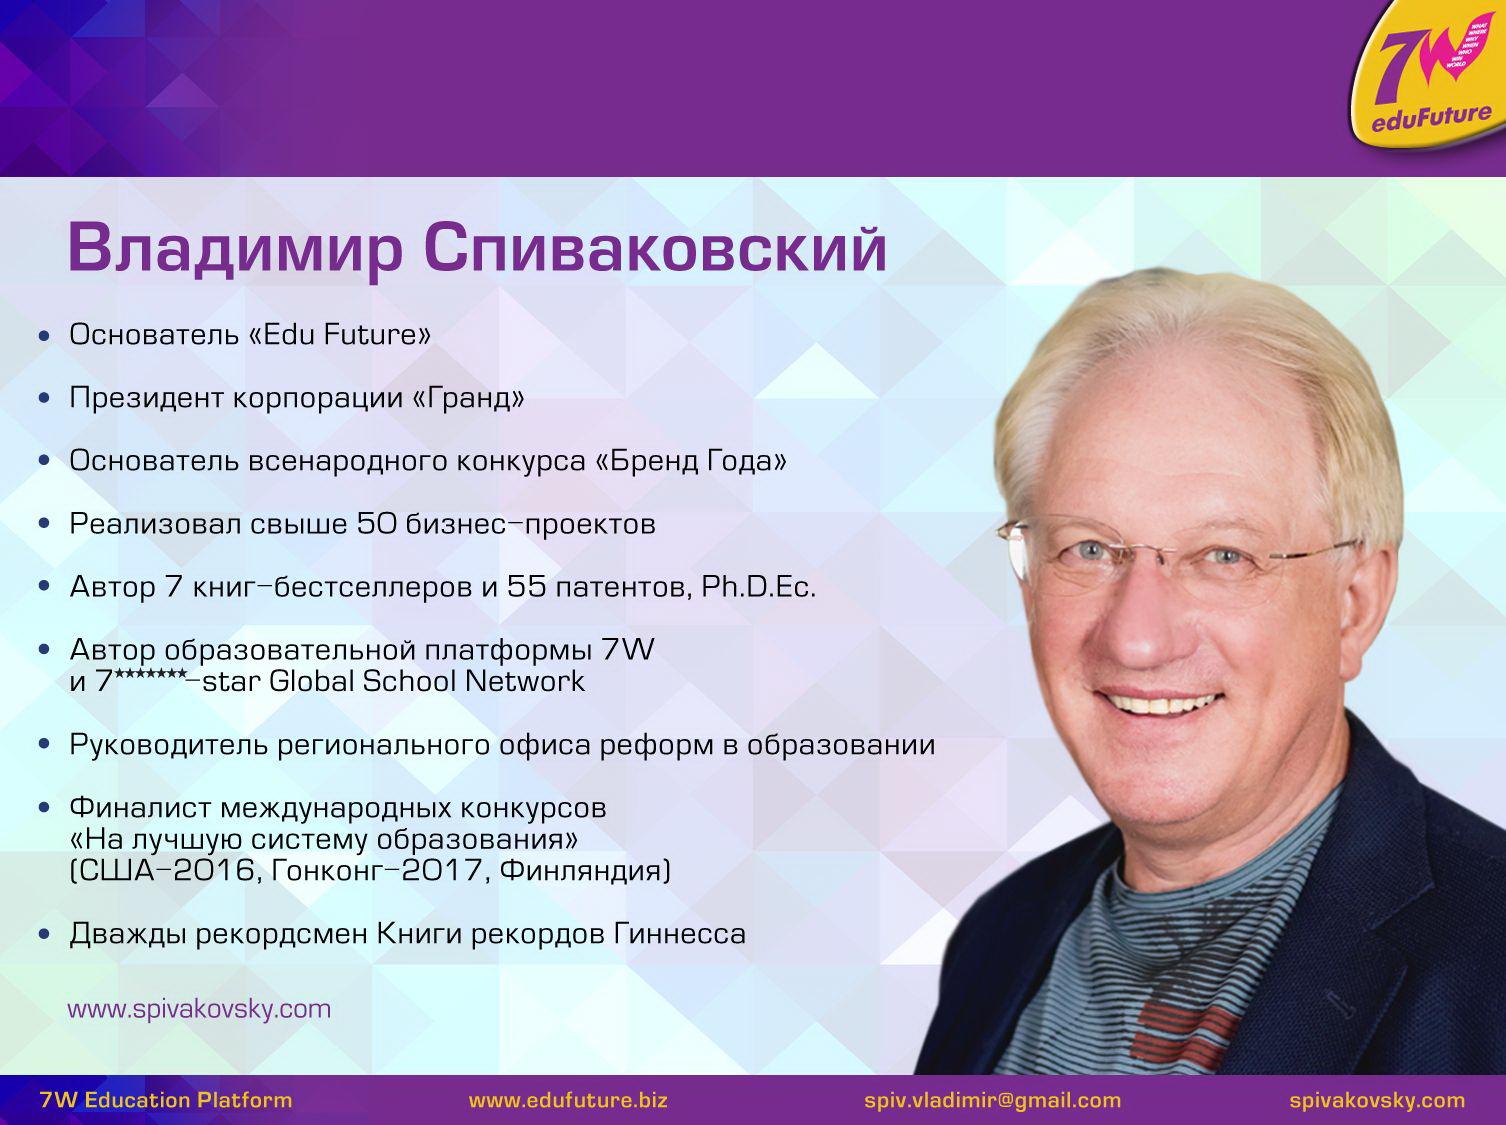 Спиваковский Владимир Михайлович